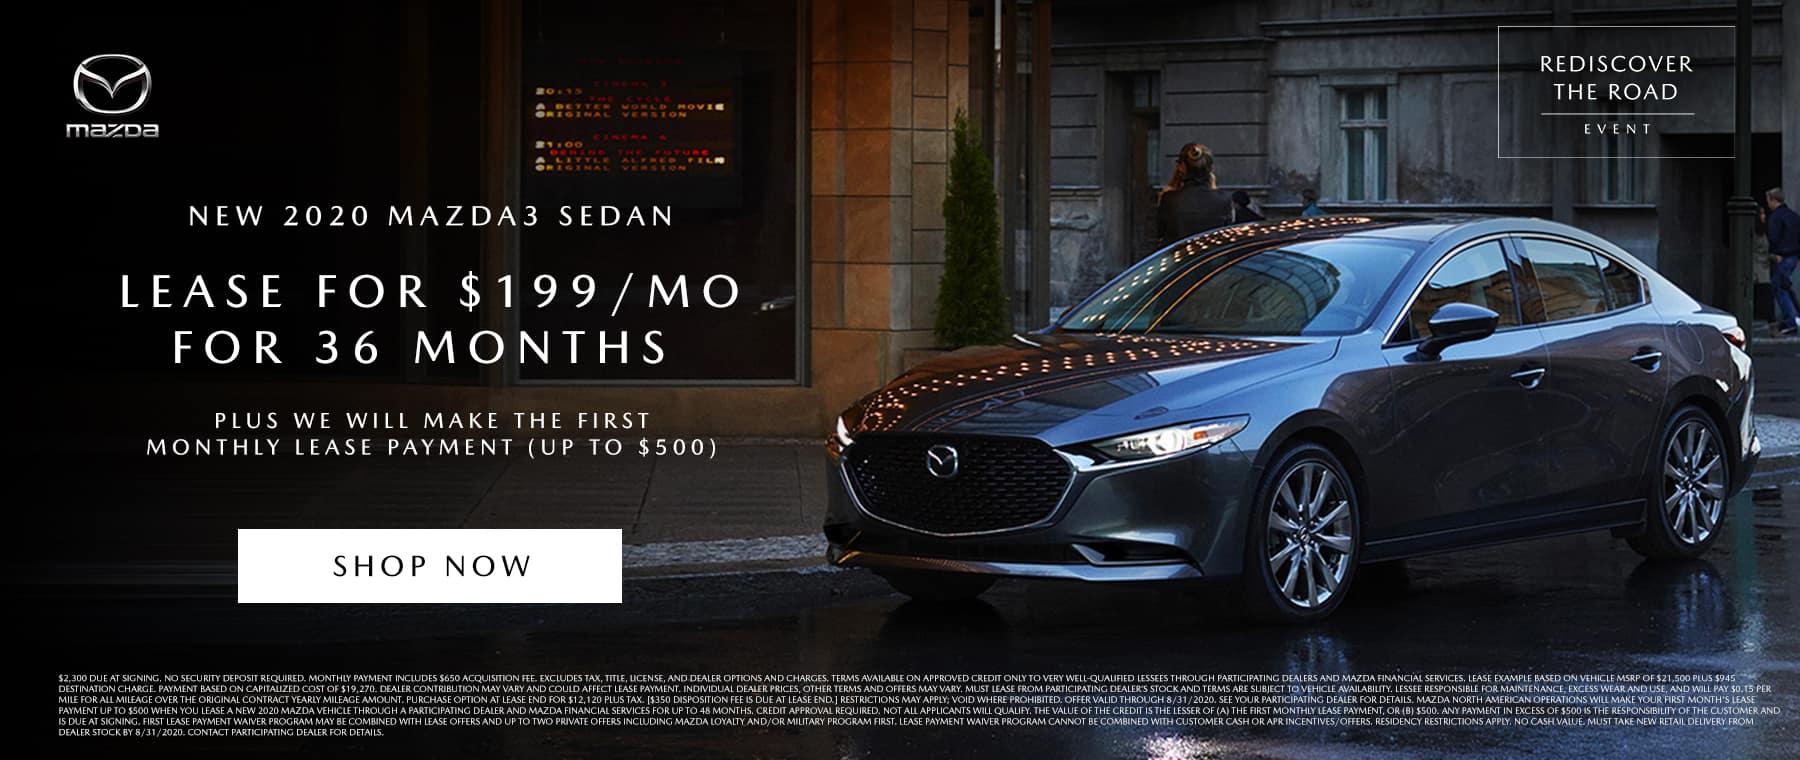 Mazda3 Sedan Lease August